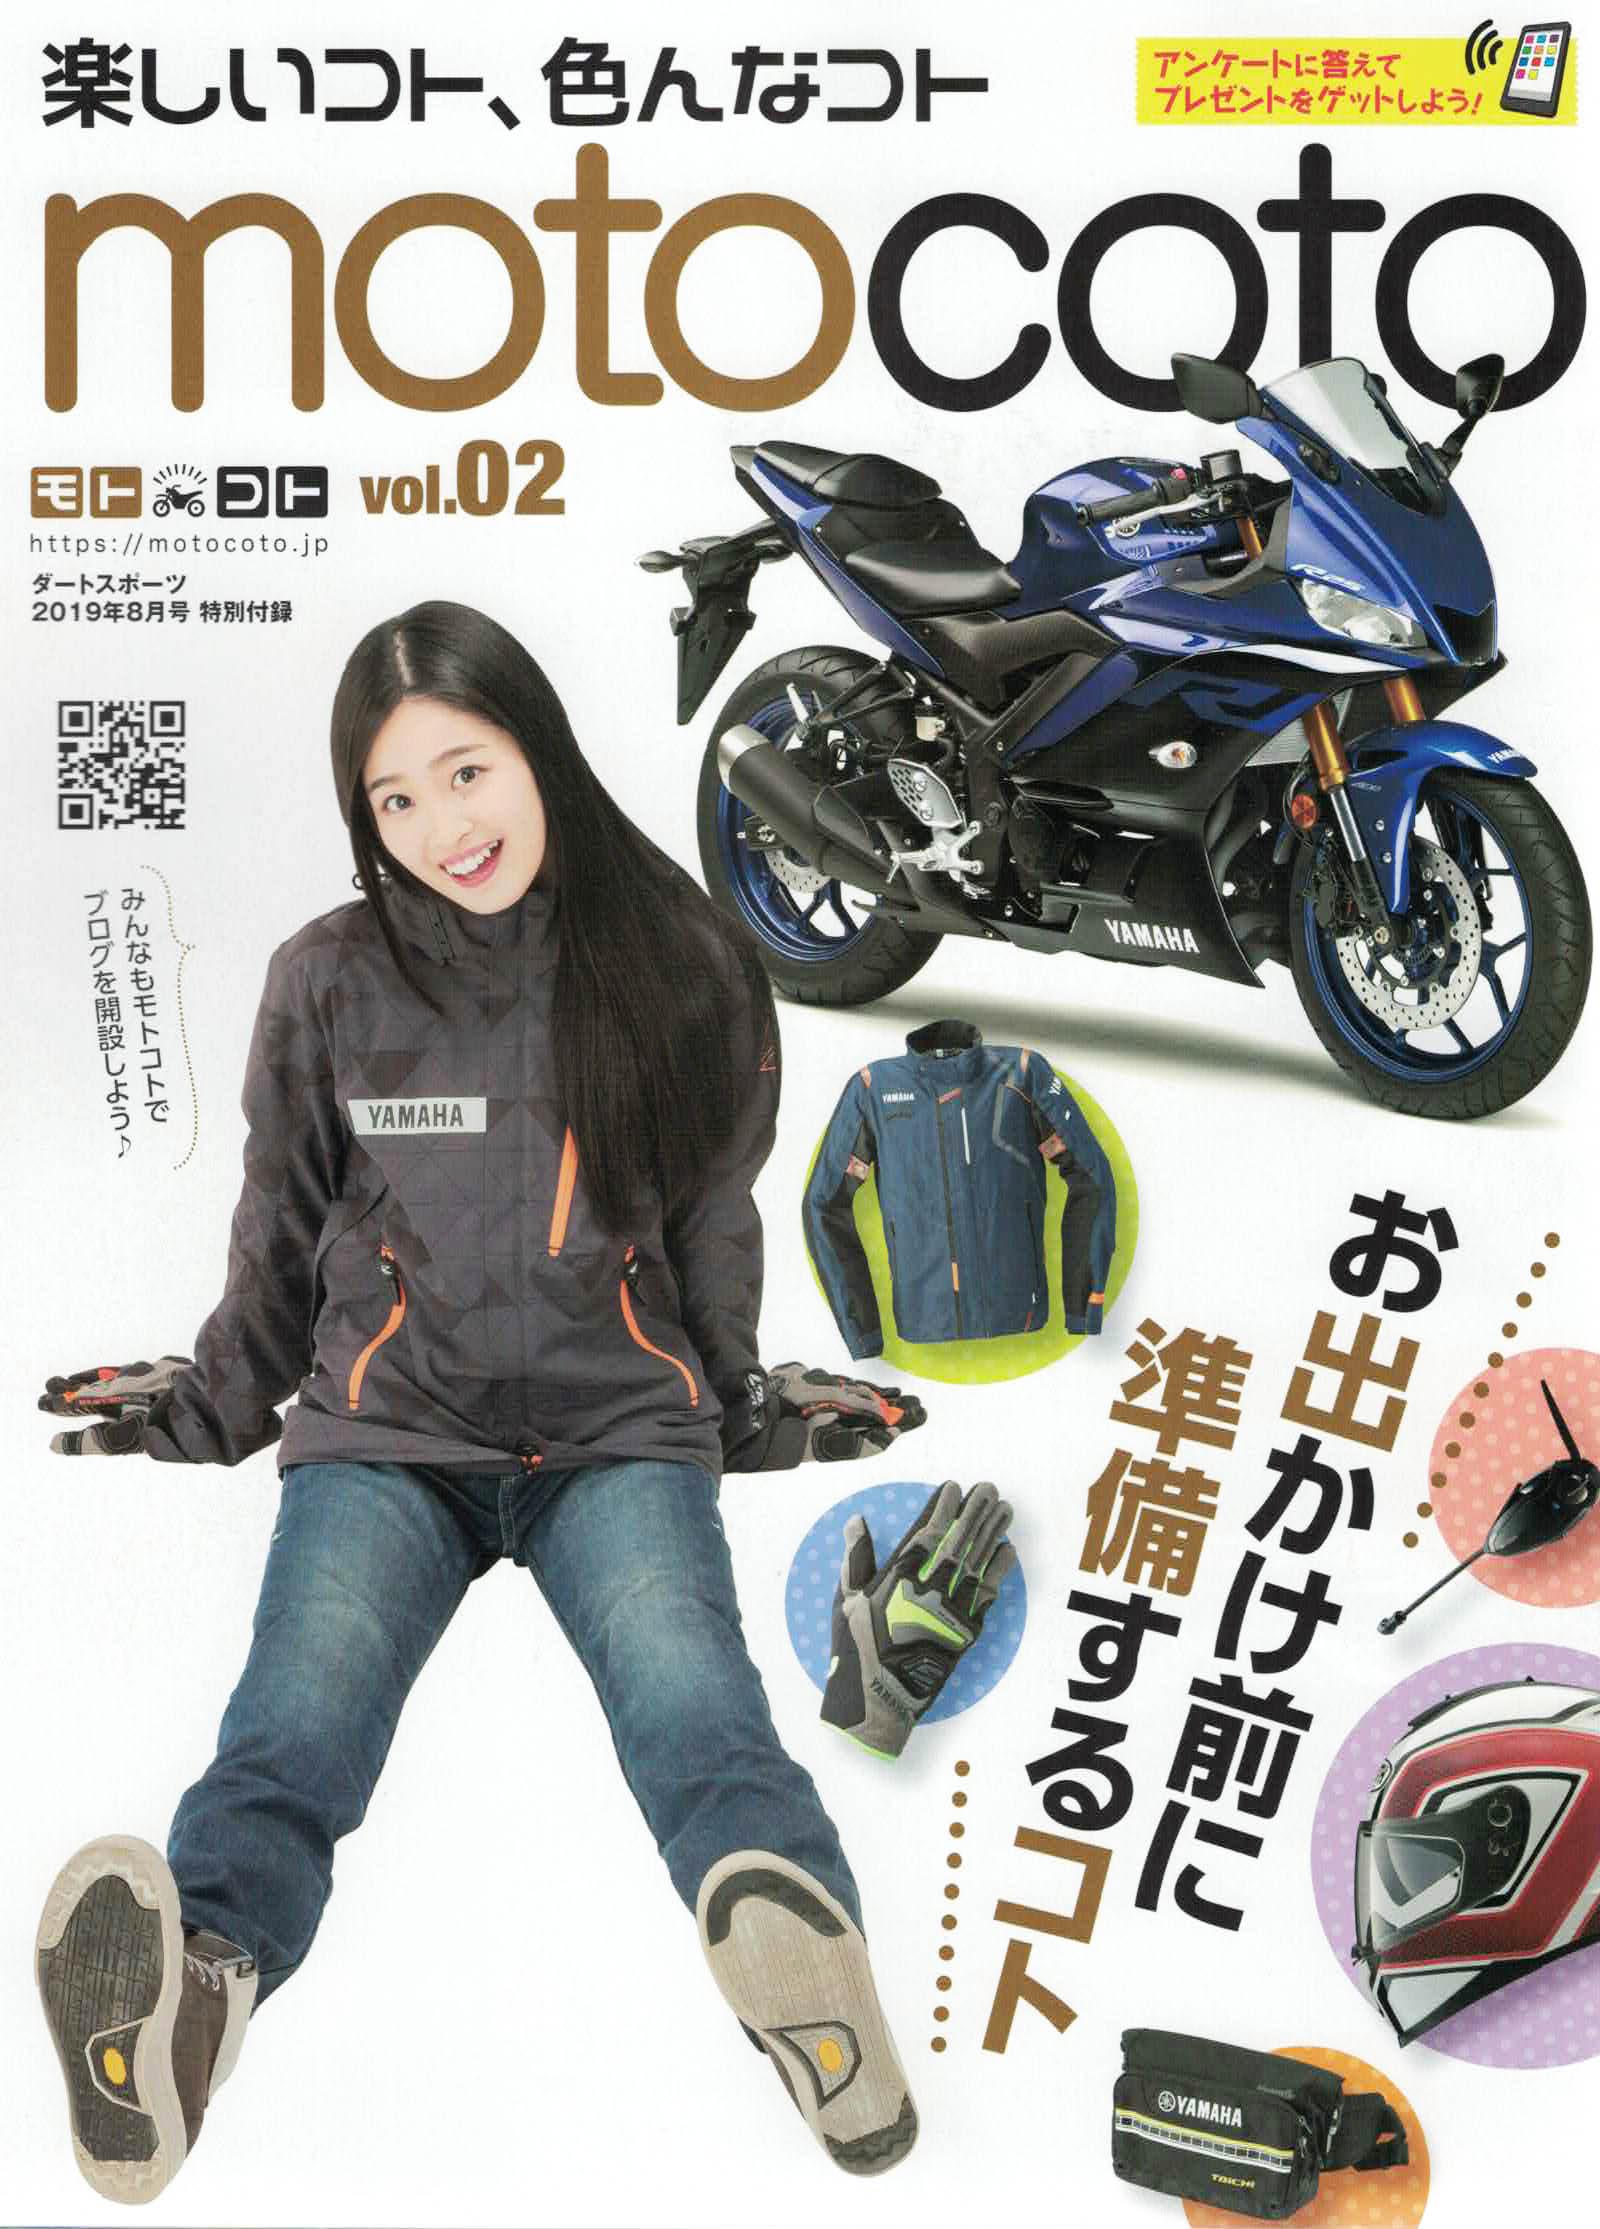 【motocoto vol.2掲載】FANTIC CABALLERO FLAT TRACK125、PANDO MOTO